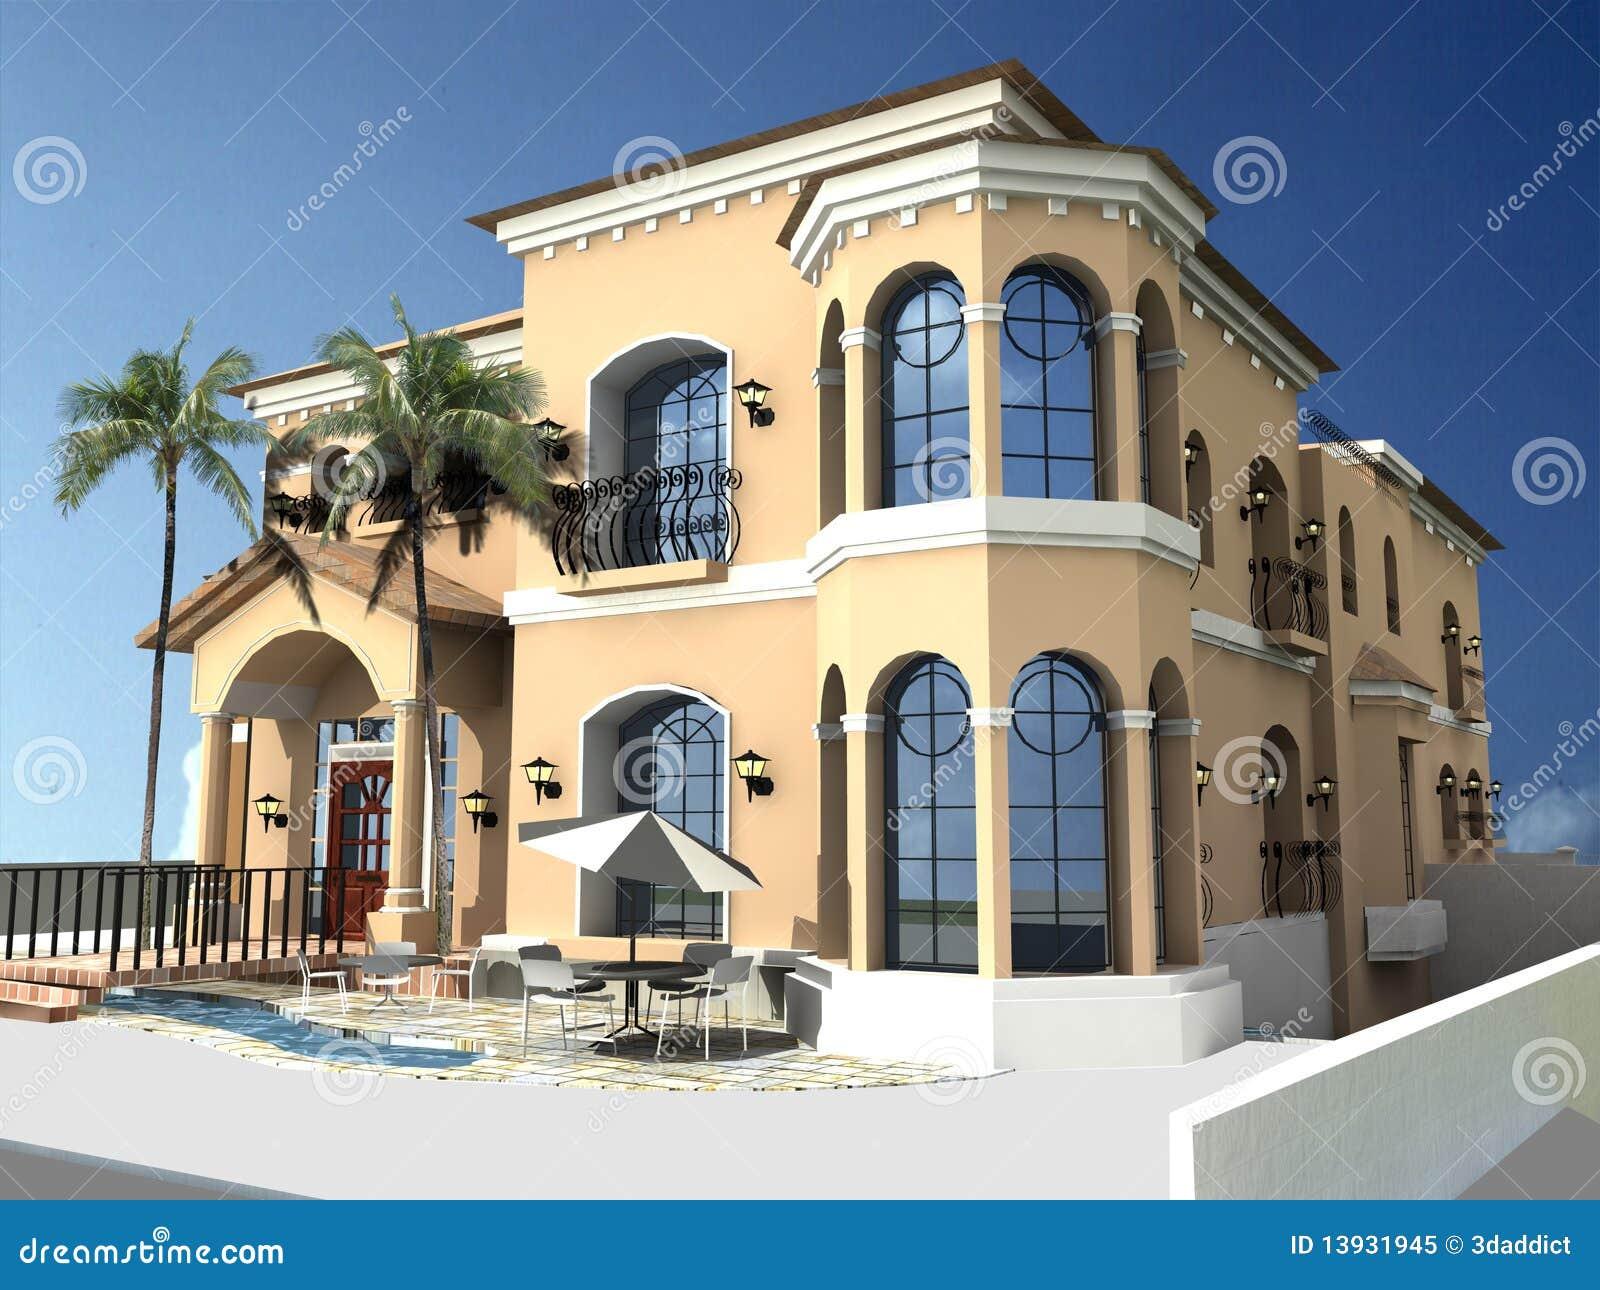 Испанская вилла фото недвижимость в испании до 30000 евро